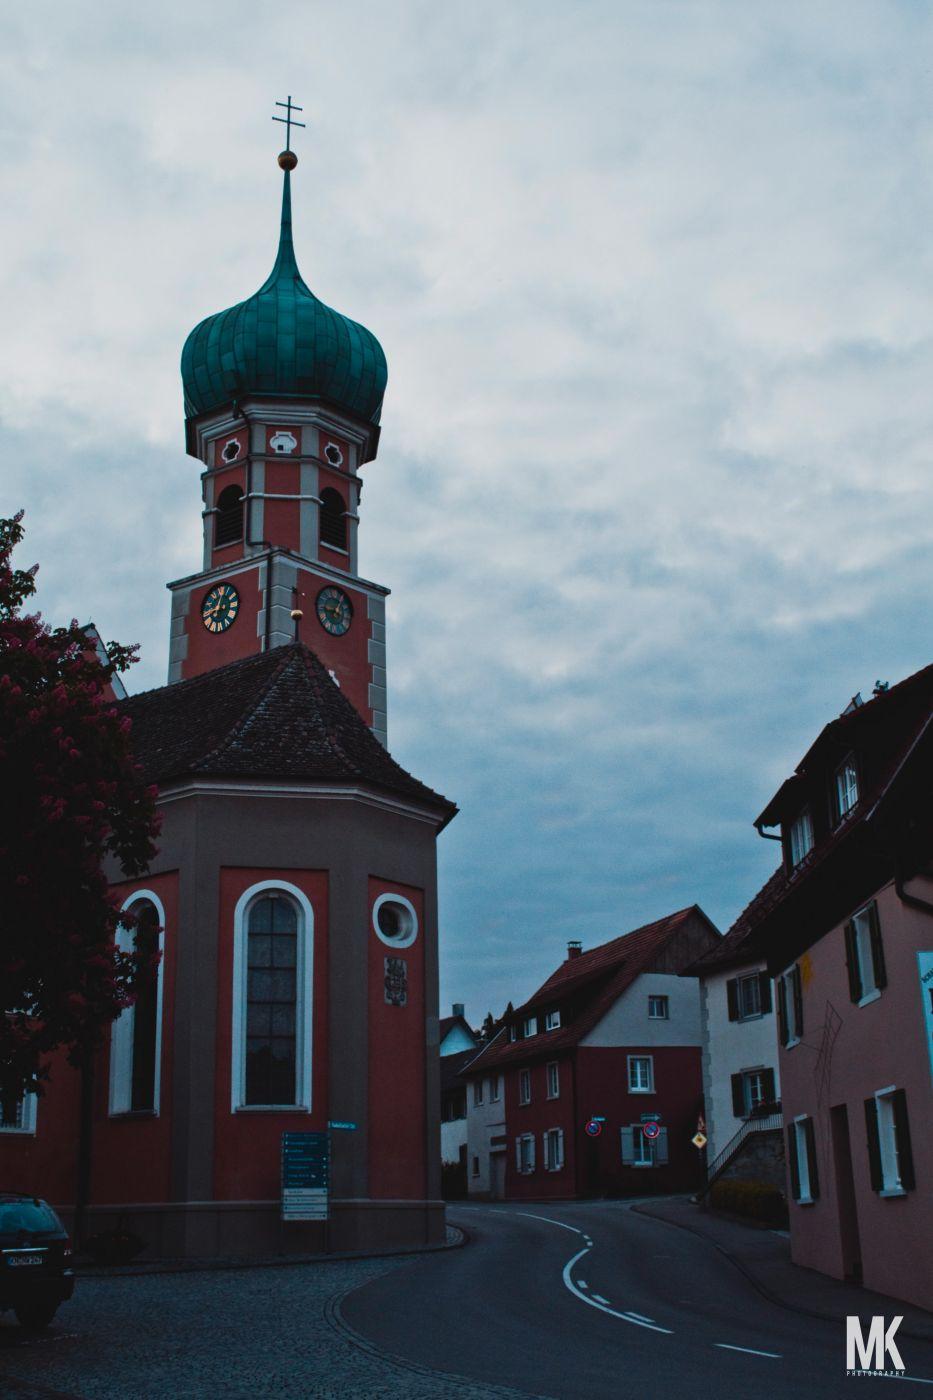 Kirche Allensbach, Germany